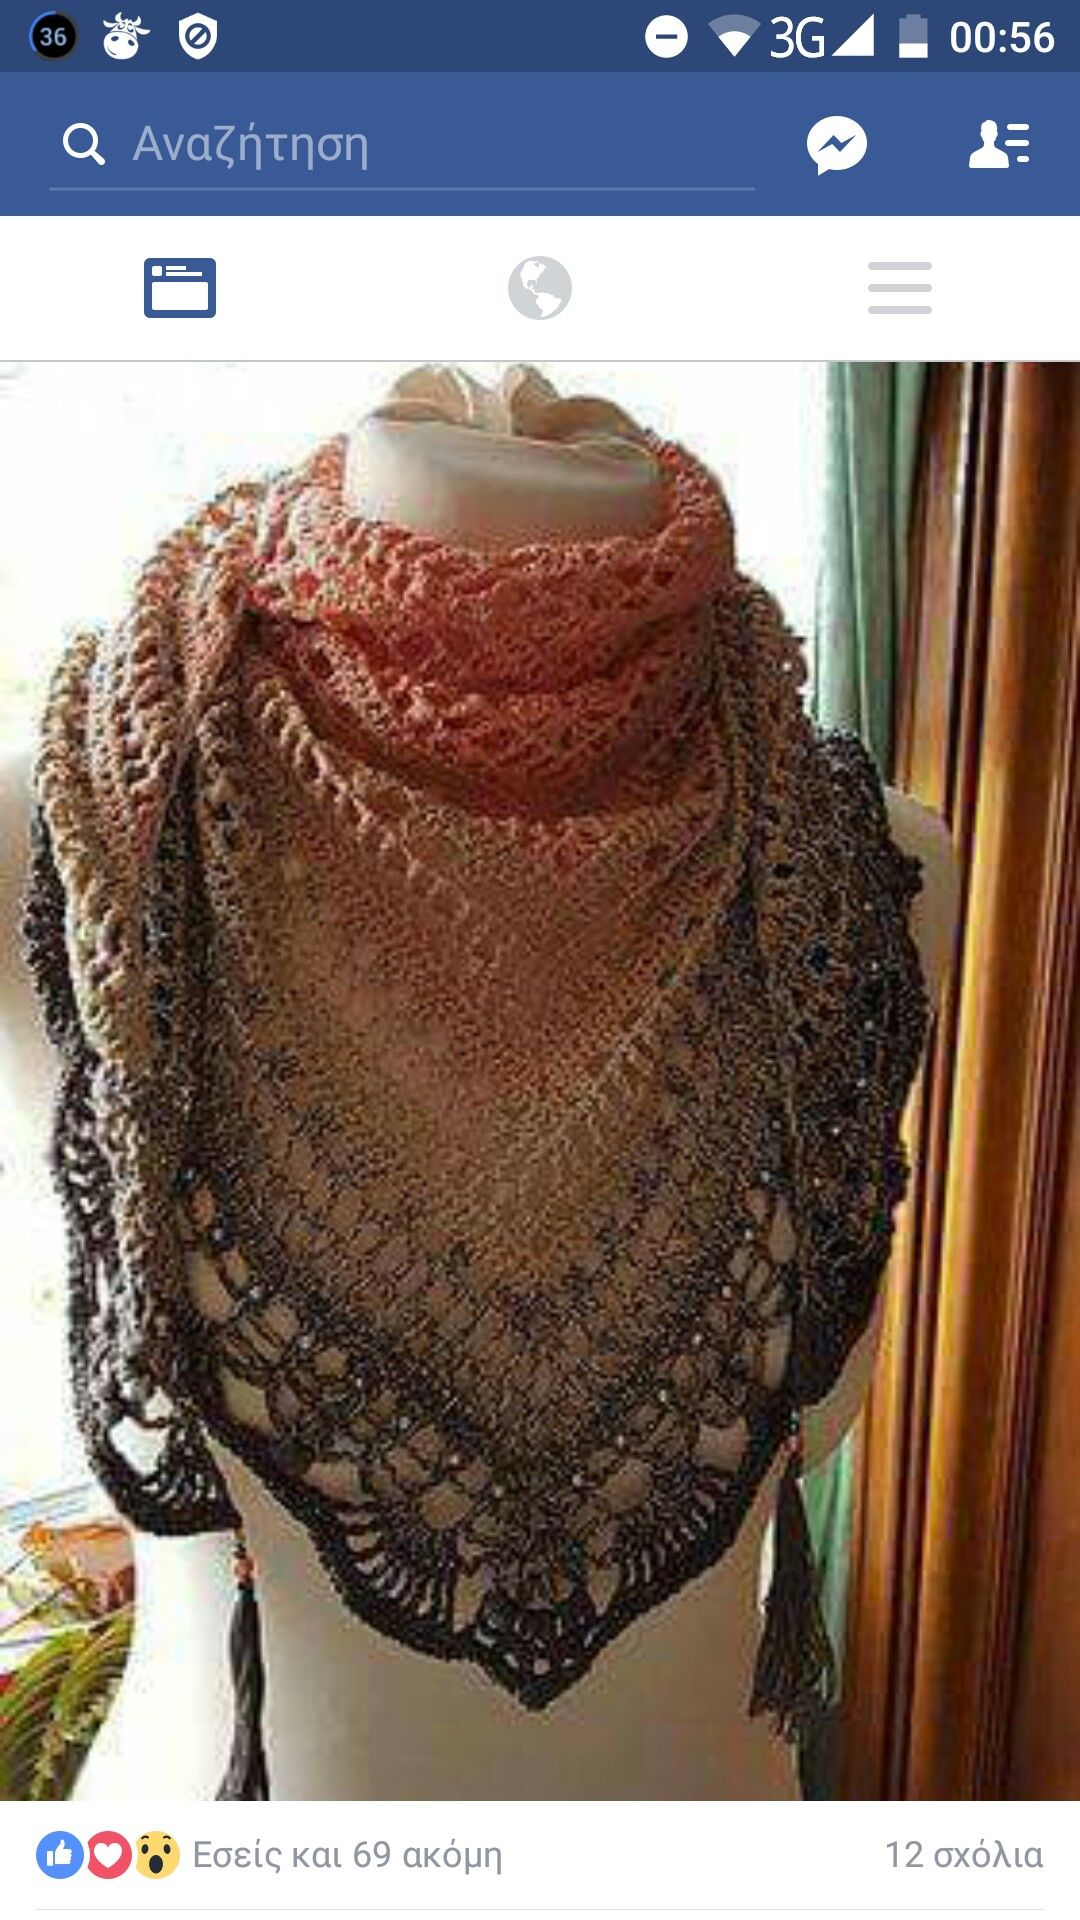 Pin de Debra DiMascio en crochet | Pinterest | Tejidos de punto ...